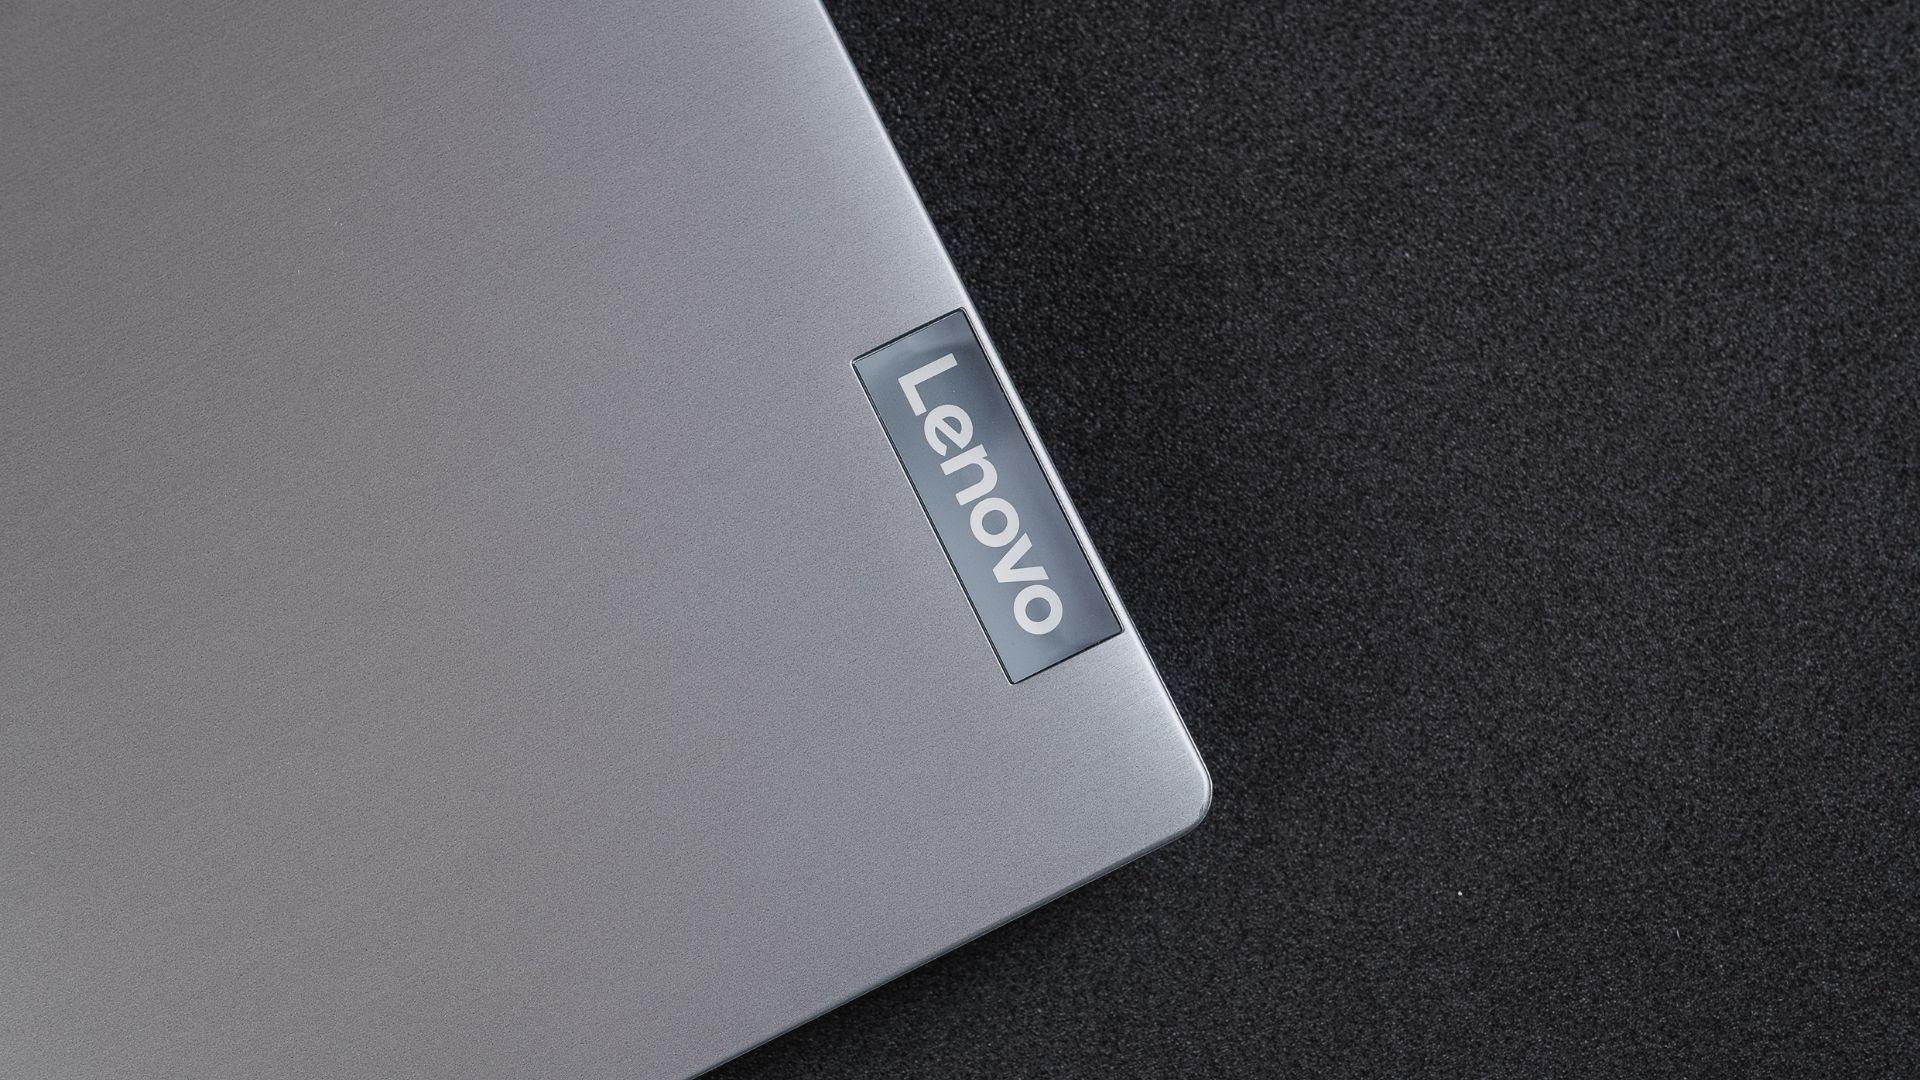 O único detalhe na tampa do Lenovo IdeaPad S145 i5 8GB SSD é a marca da Lenovo na lateral (Foto: Zoom)